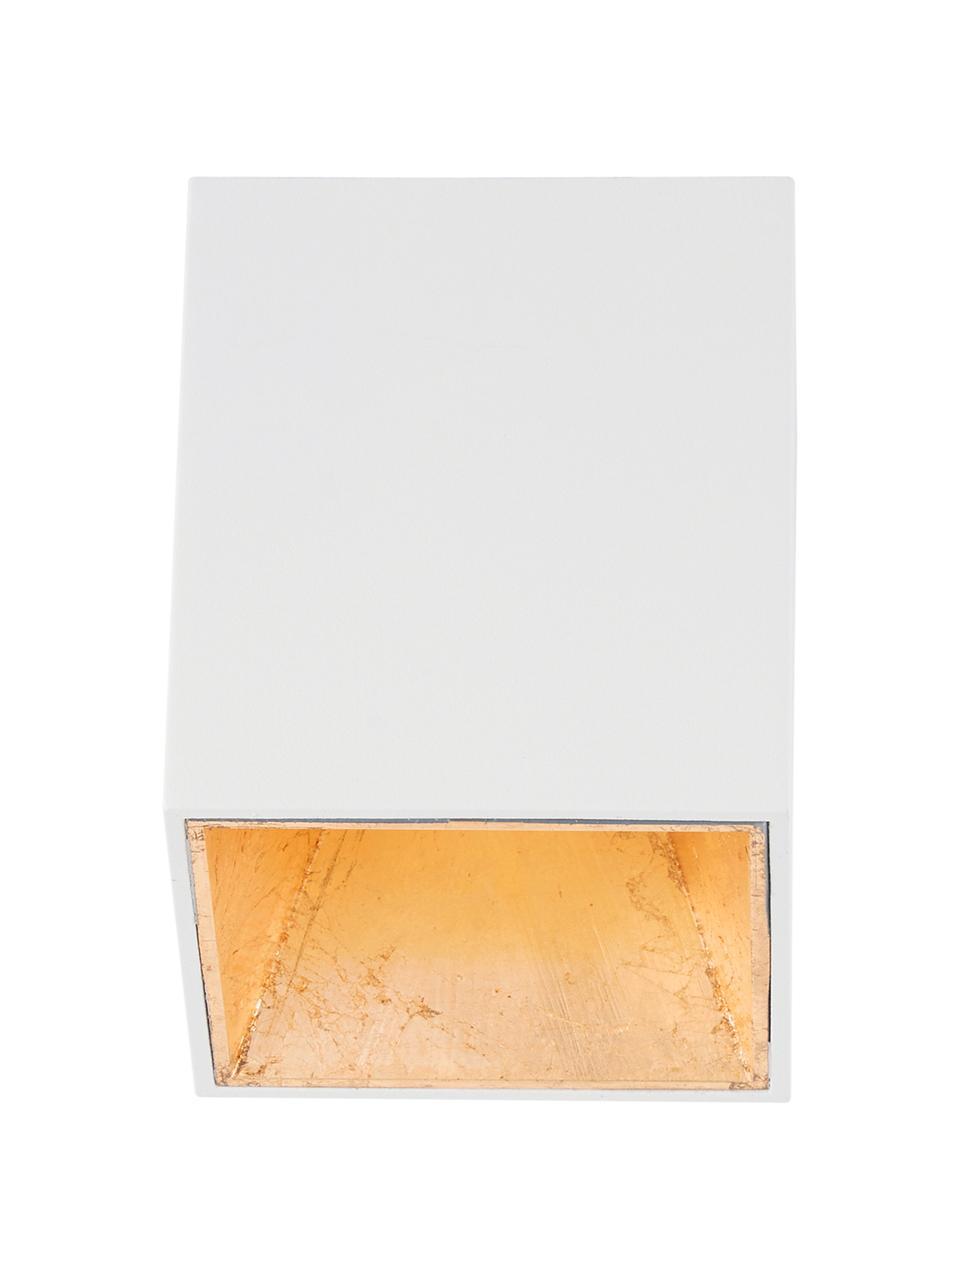 LED-Deckenspot Marty, Weiß, Goldfarben, 10 x 12 cm